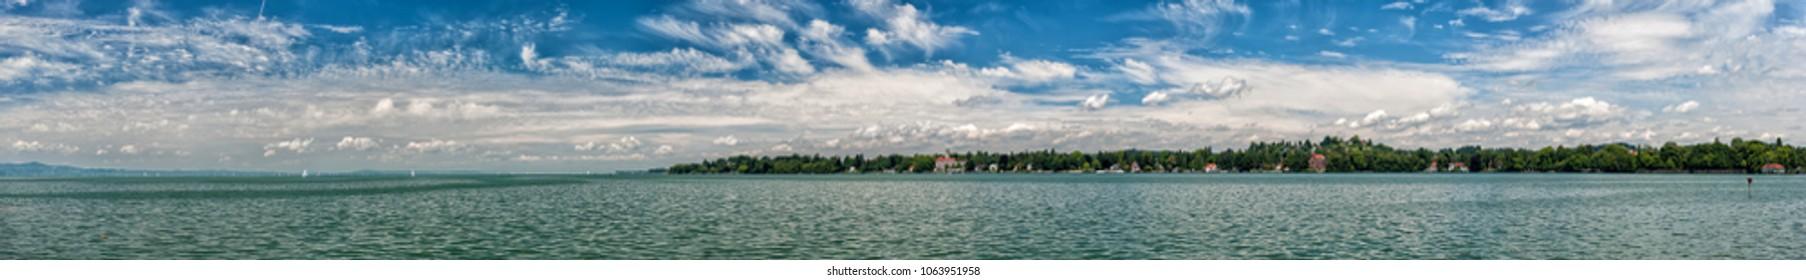 Lindau lake in Bavaria